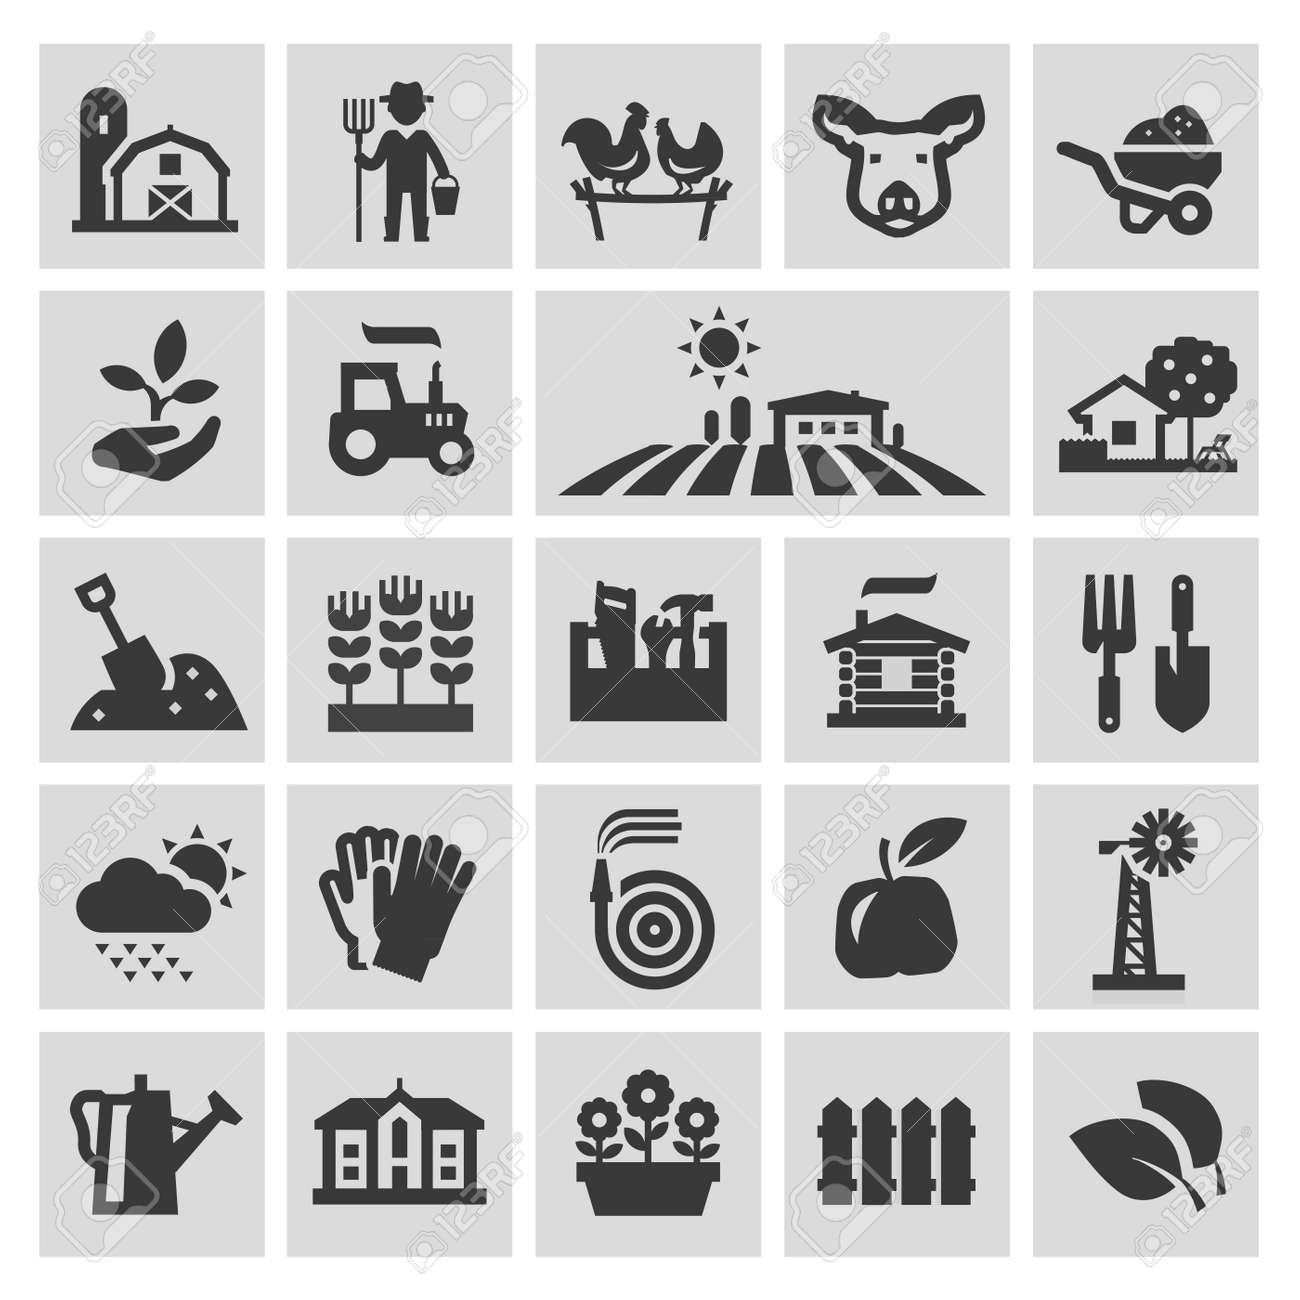 farm. set of black icons on gray background. vector illustration - 48601961